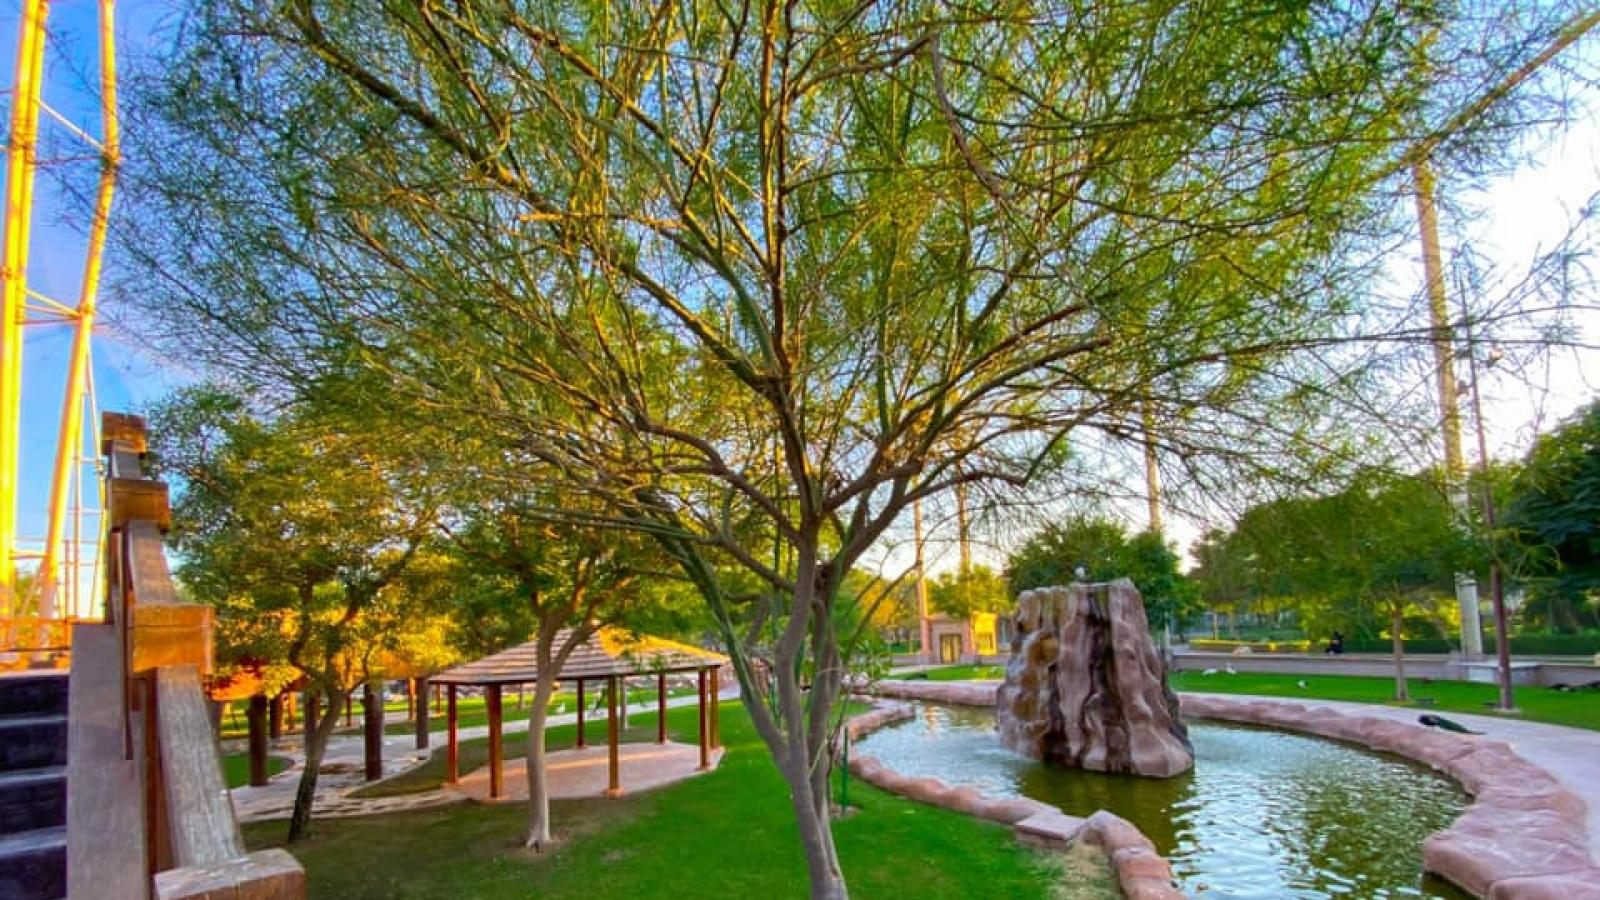 Five stunning parks to visit in Qatar